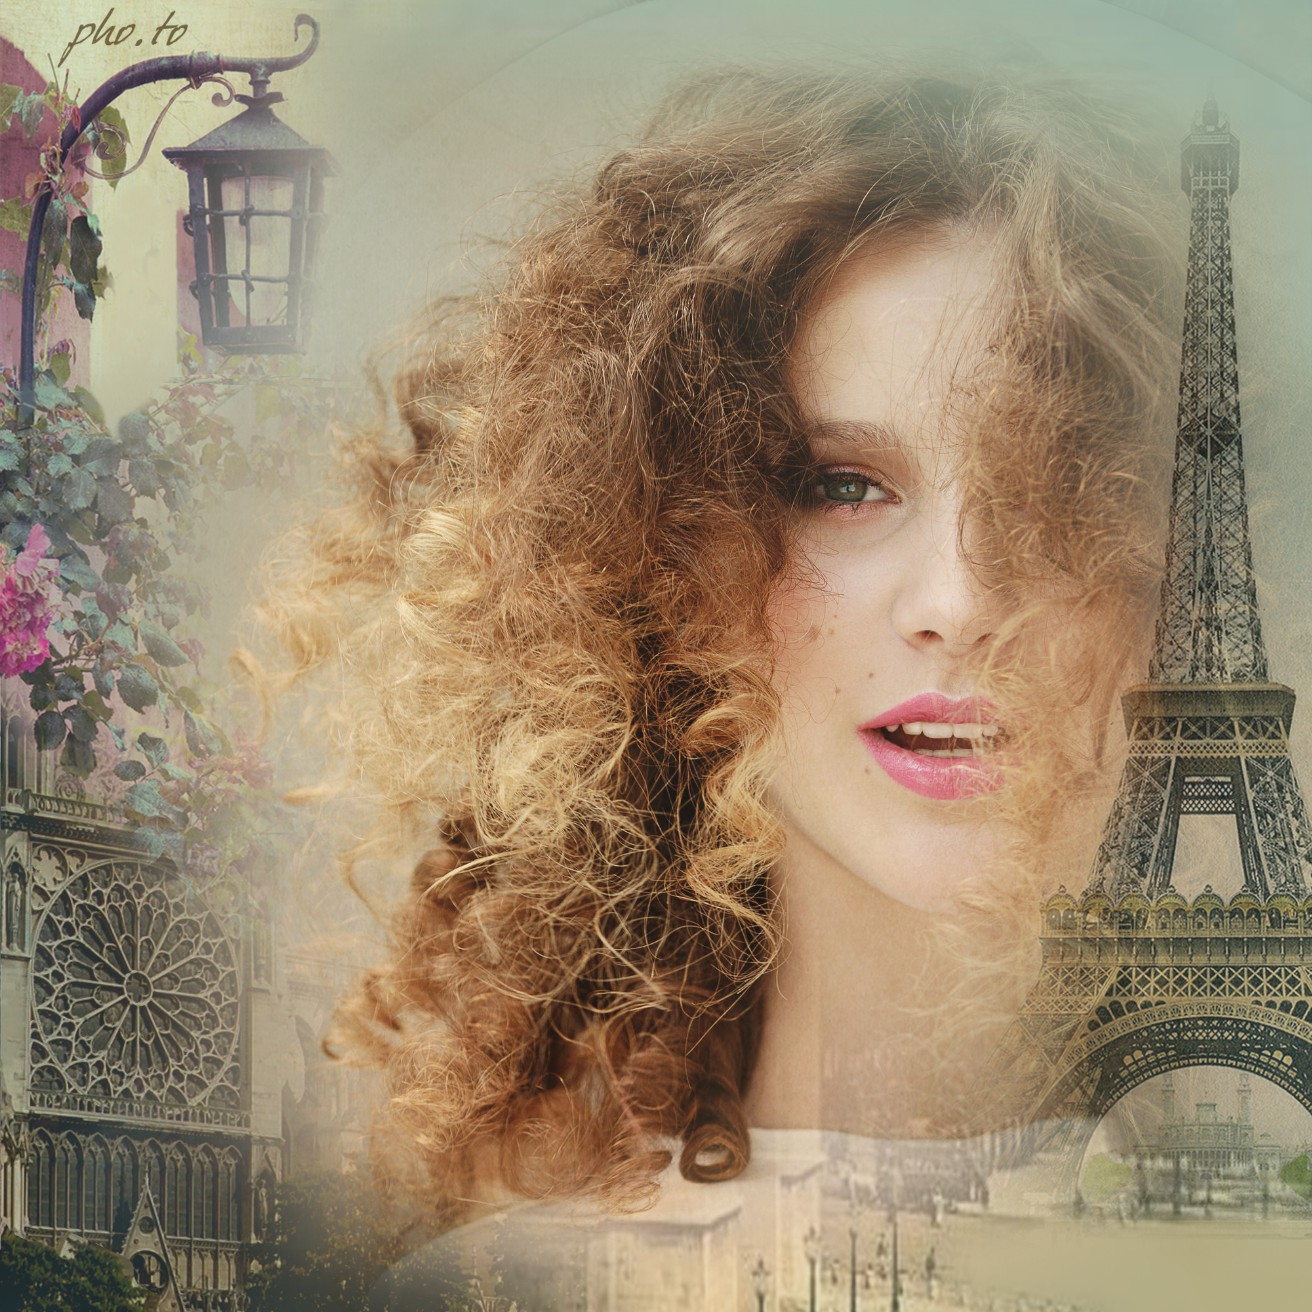 paris photo frame change photo background online